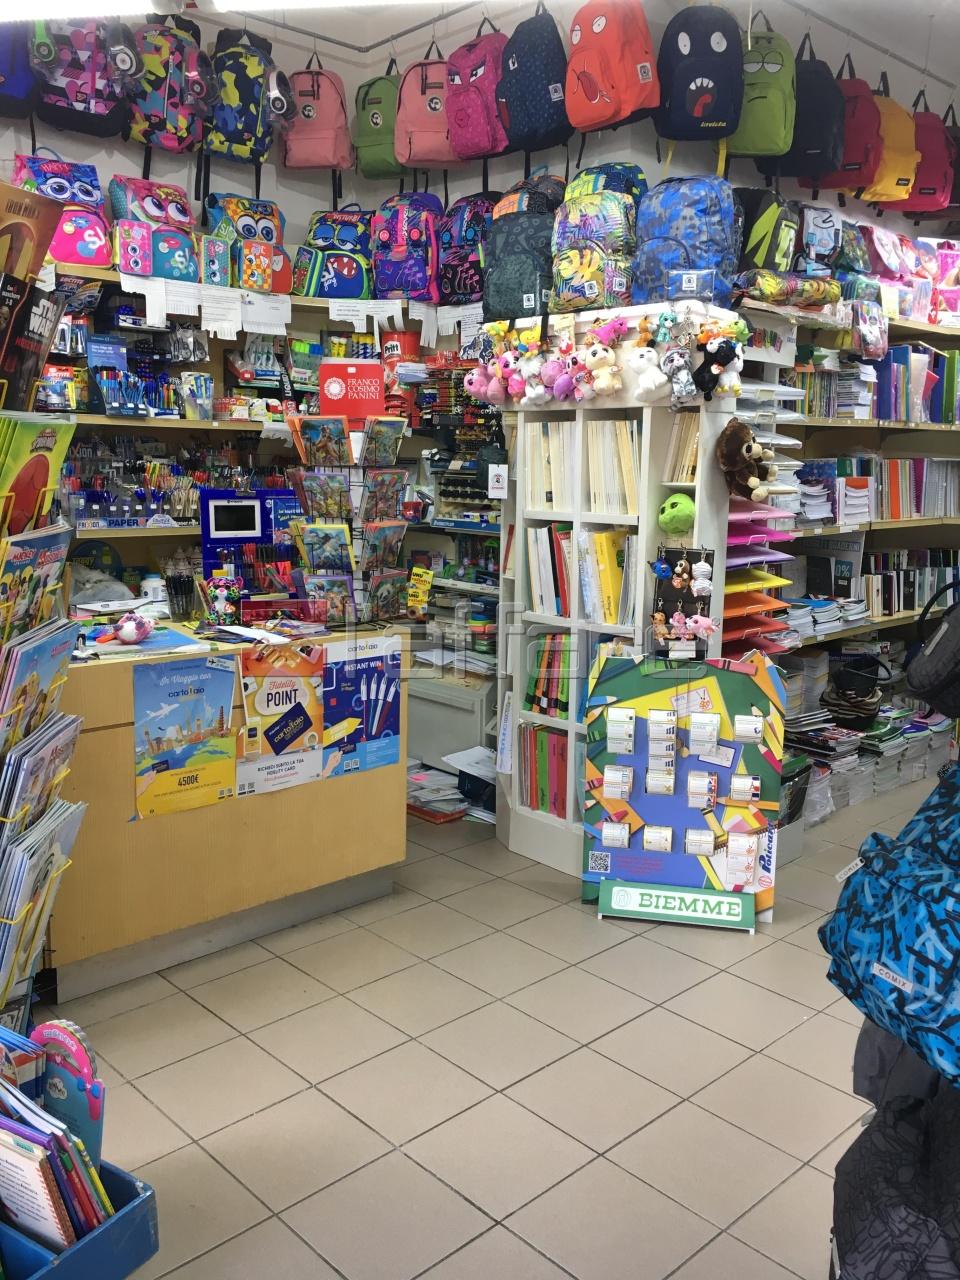 Cartoleria - Libreria a Capannoli